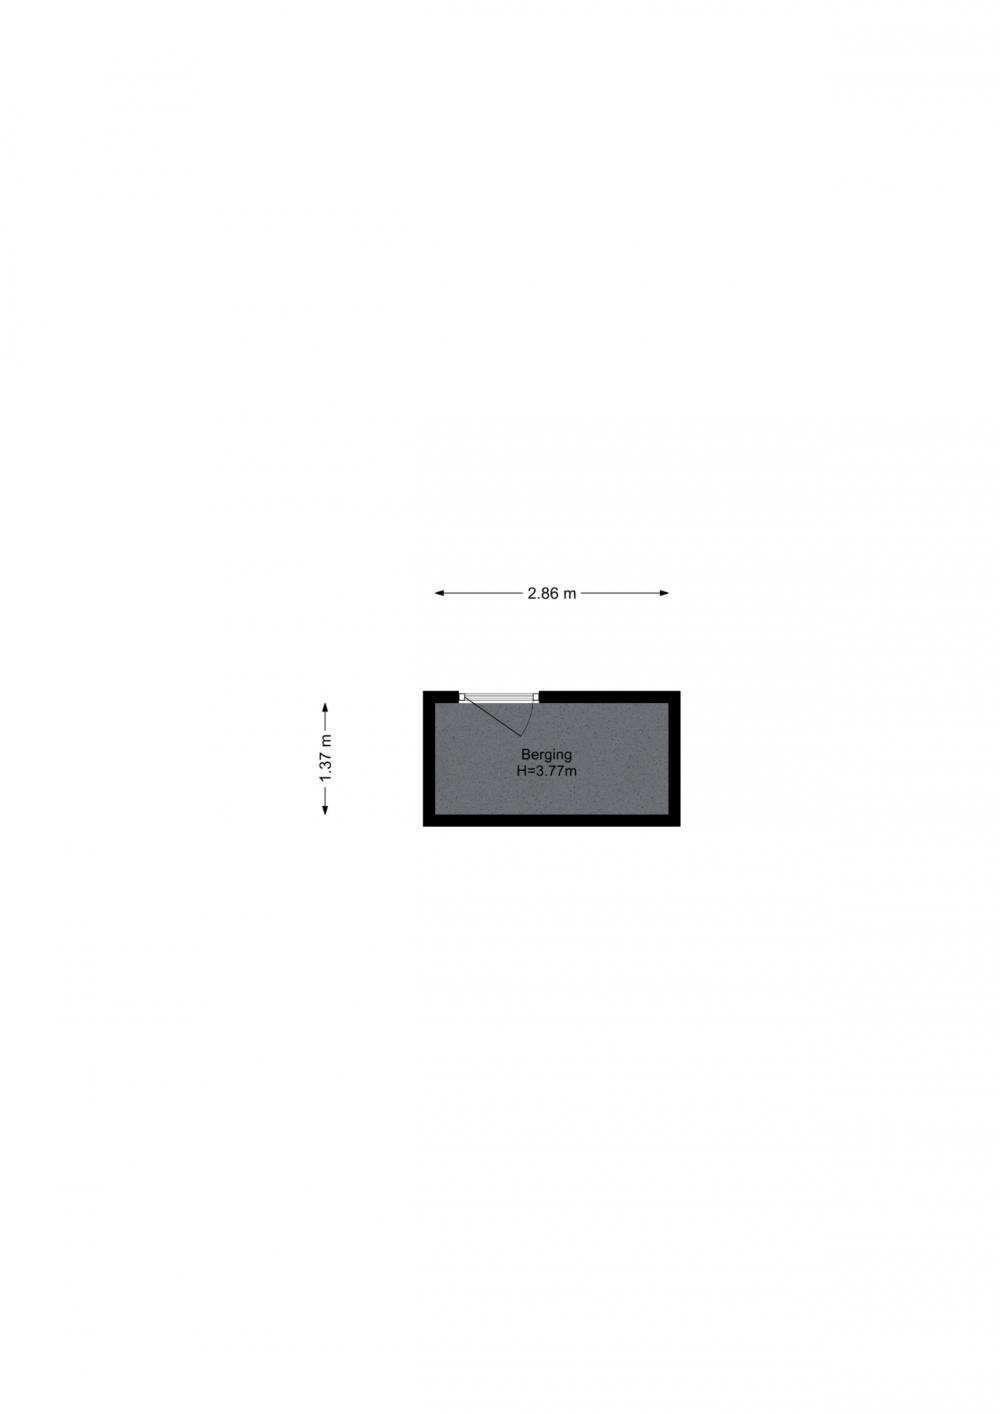 lochem-tramstraat-41